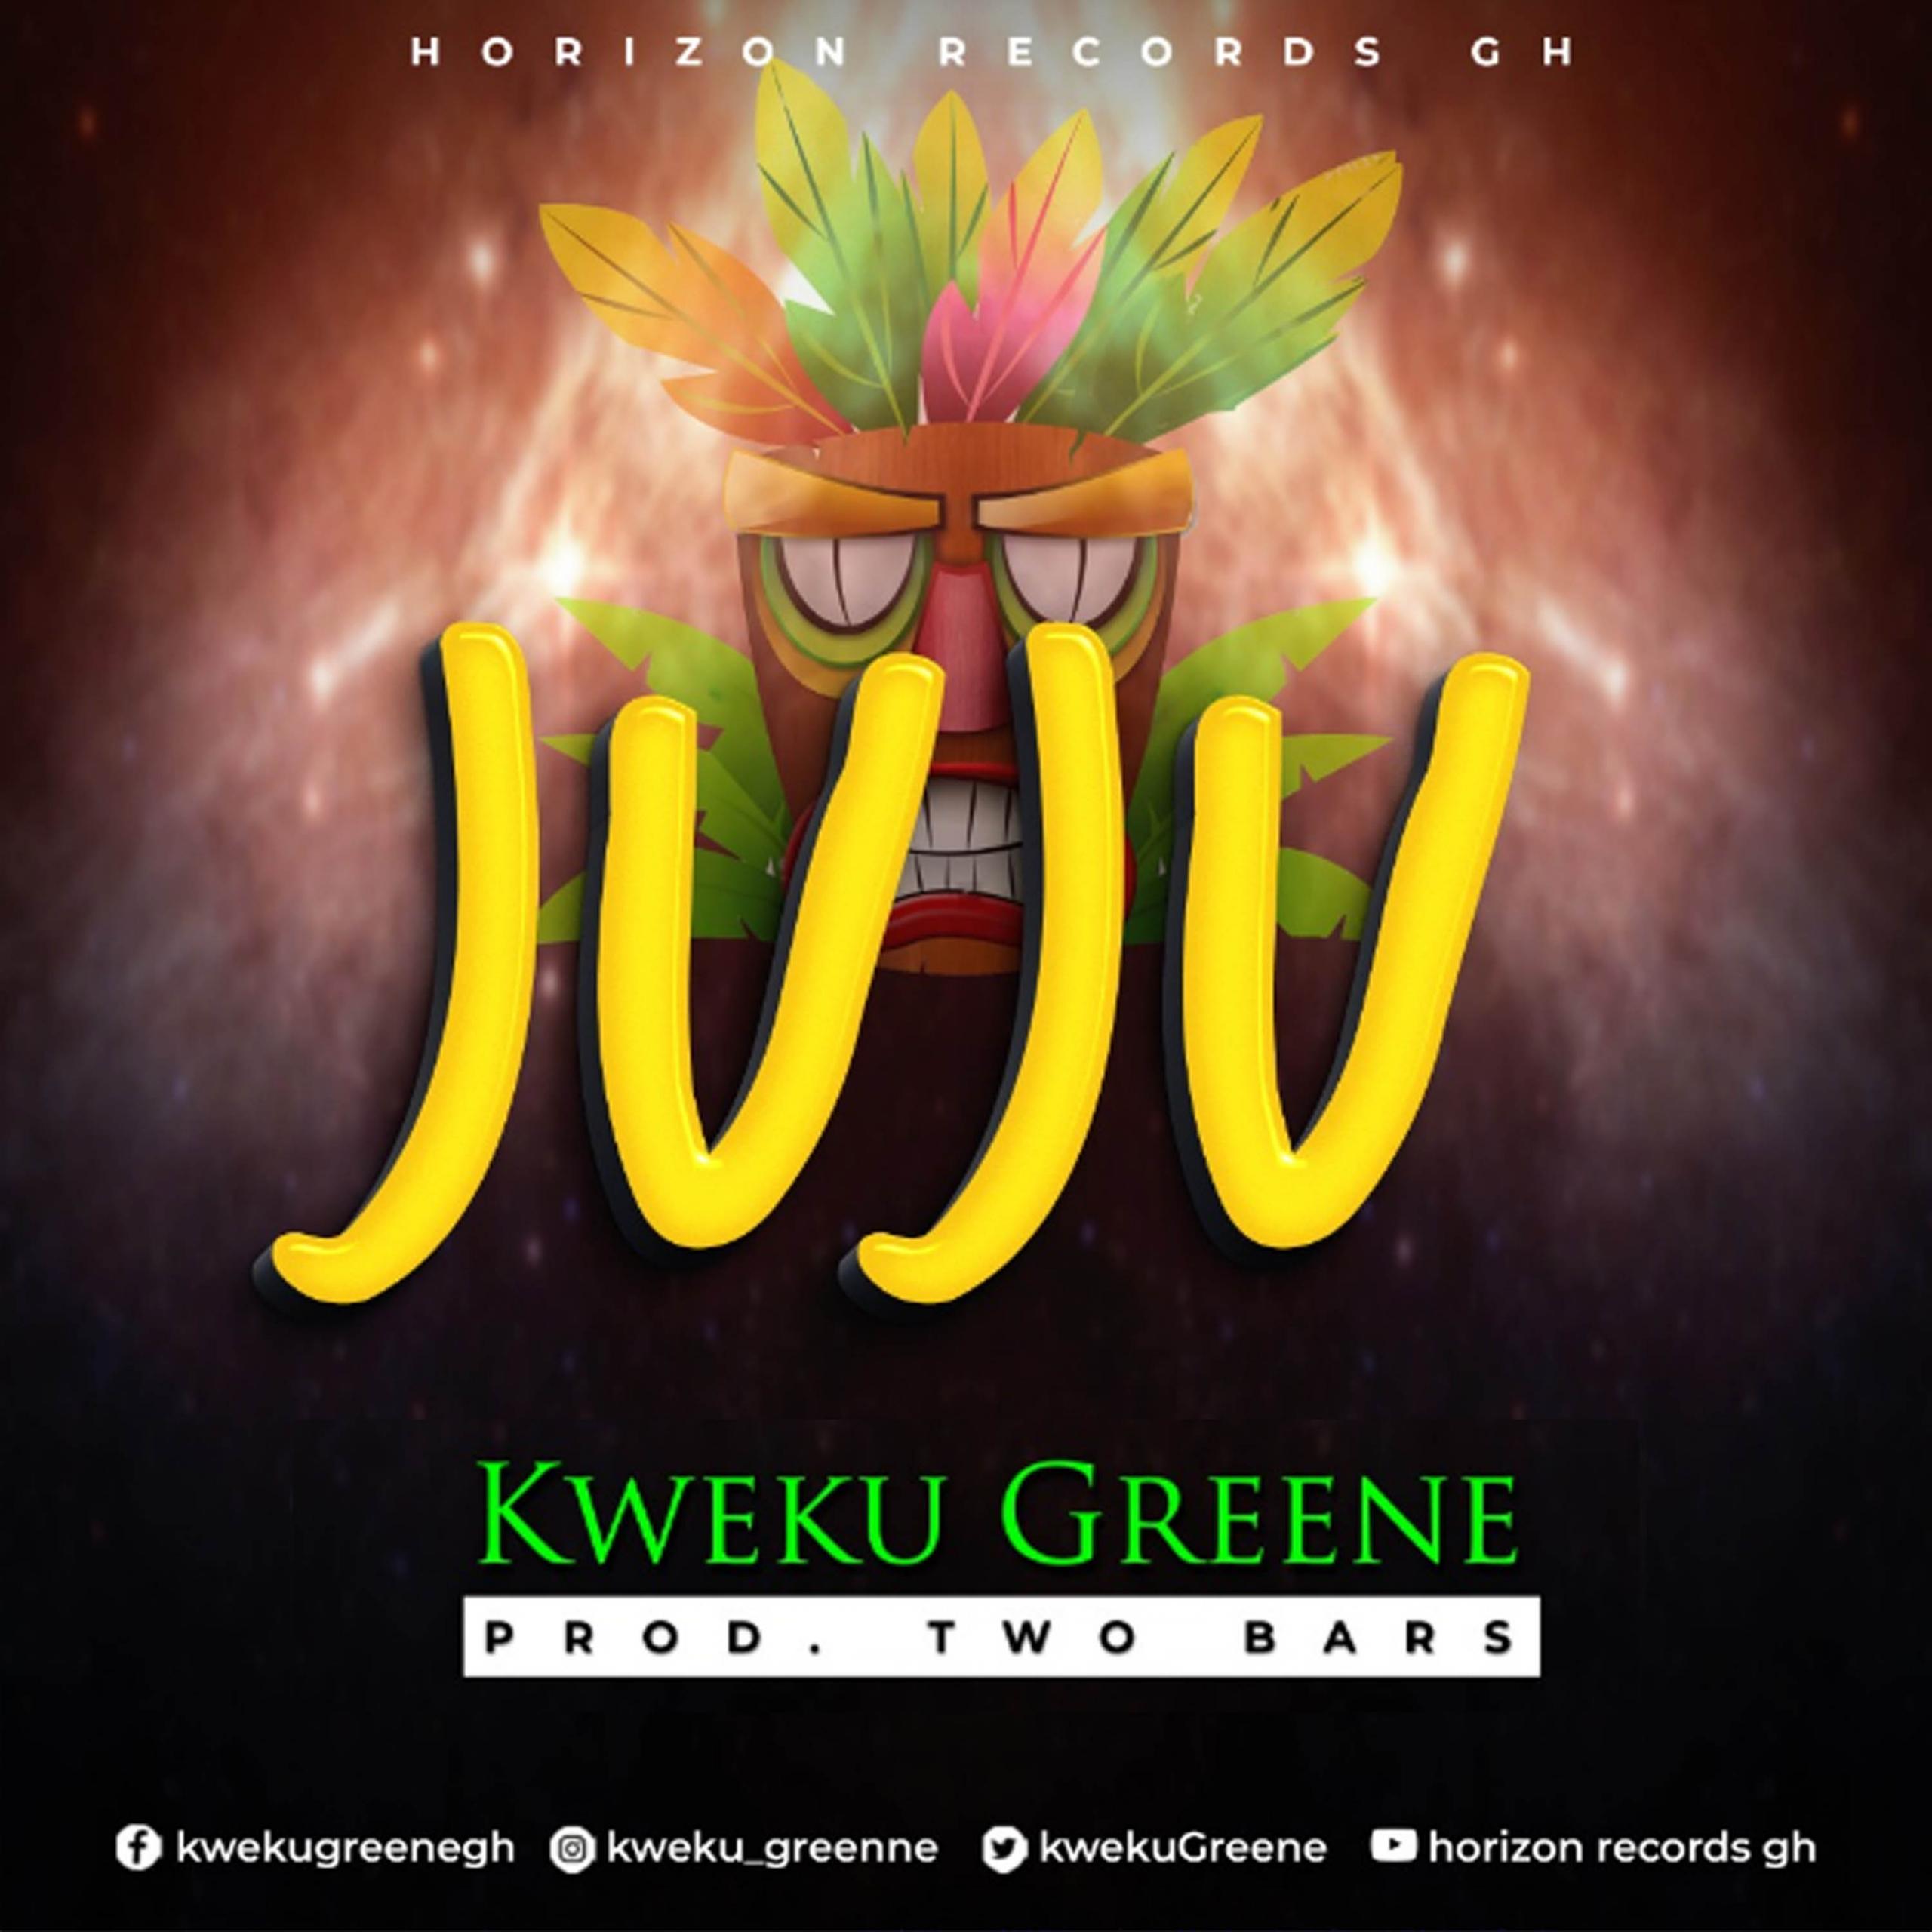 Kweku Greene – Juju (Prod by Twobars)